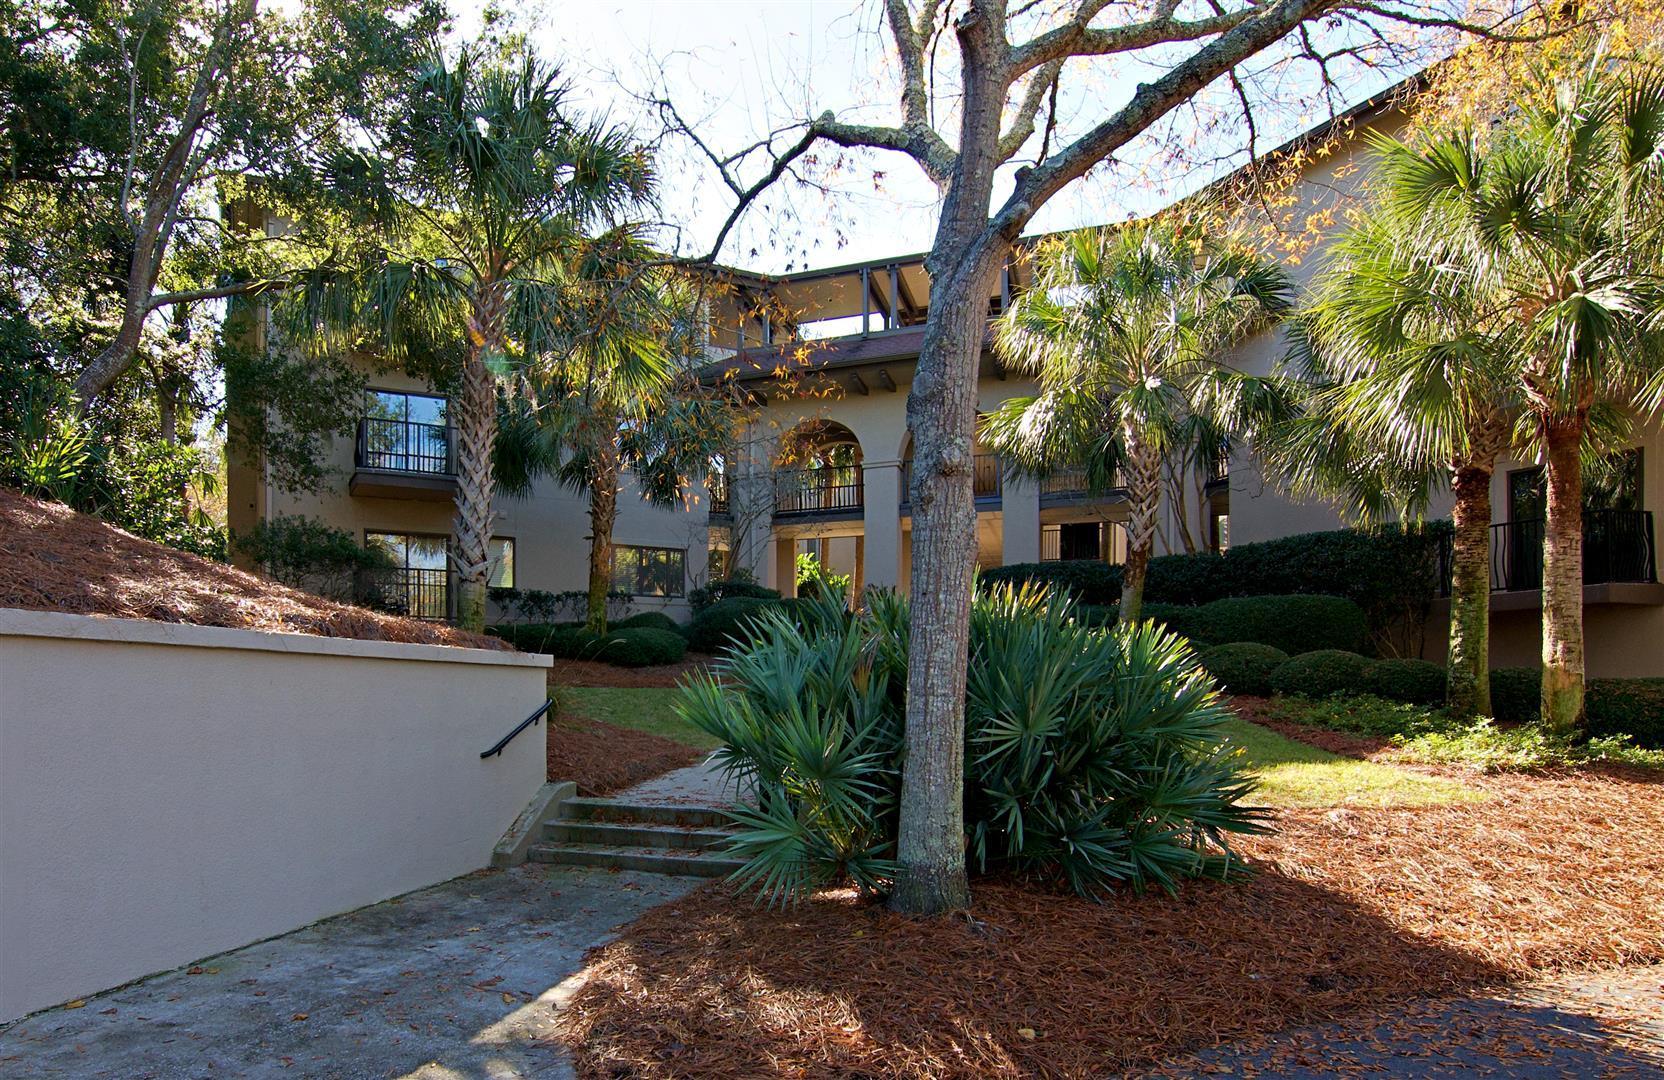 Seabrook Island Homes For Sale - 3020 Ocean Winds, Seabrook Island, SC - 9